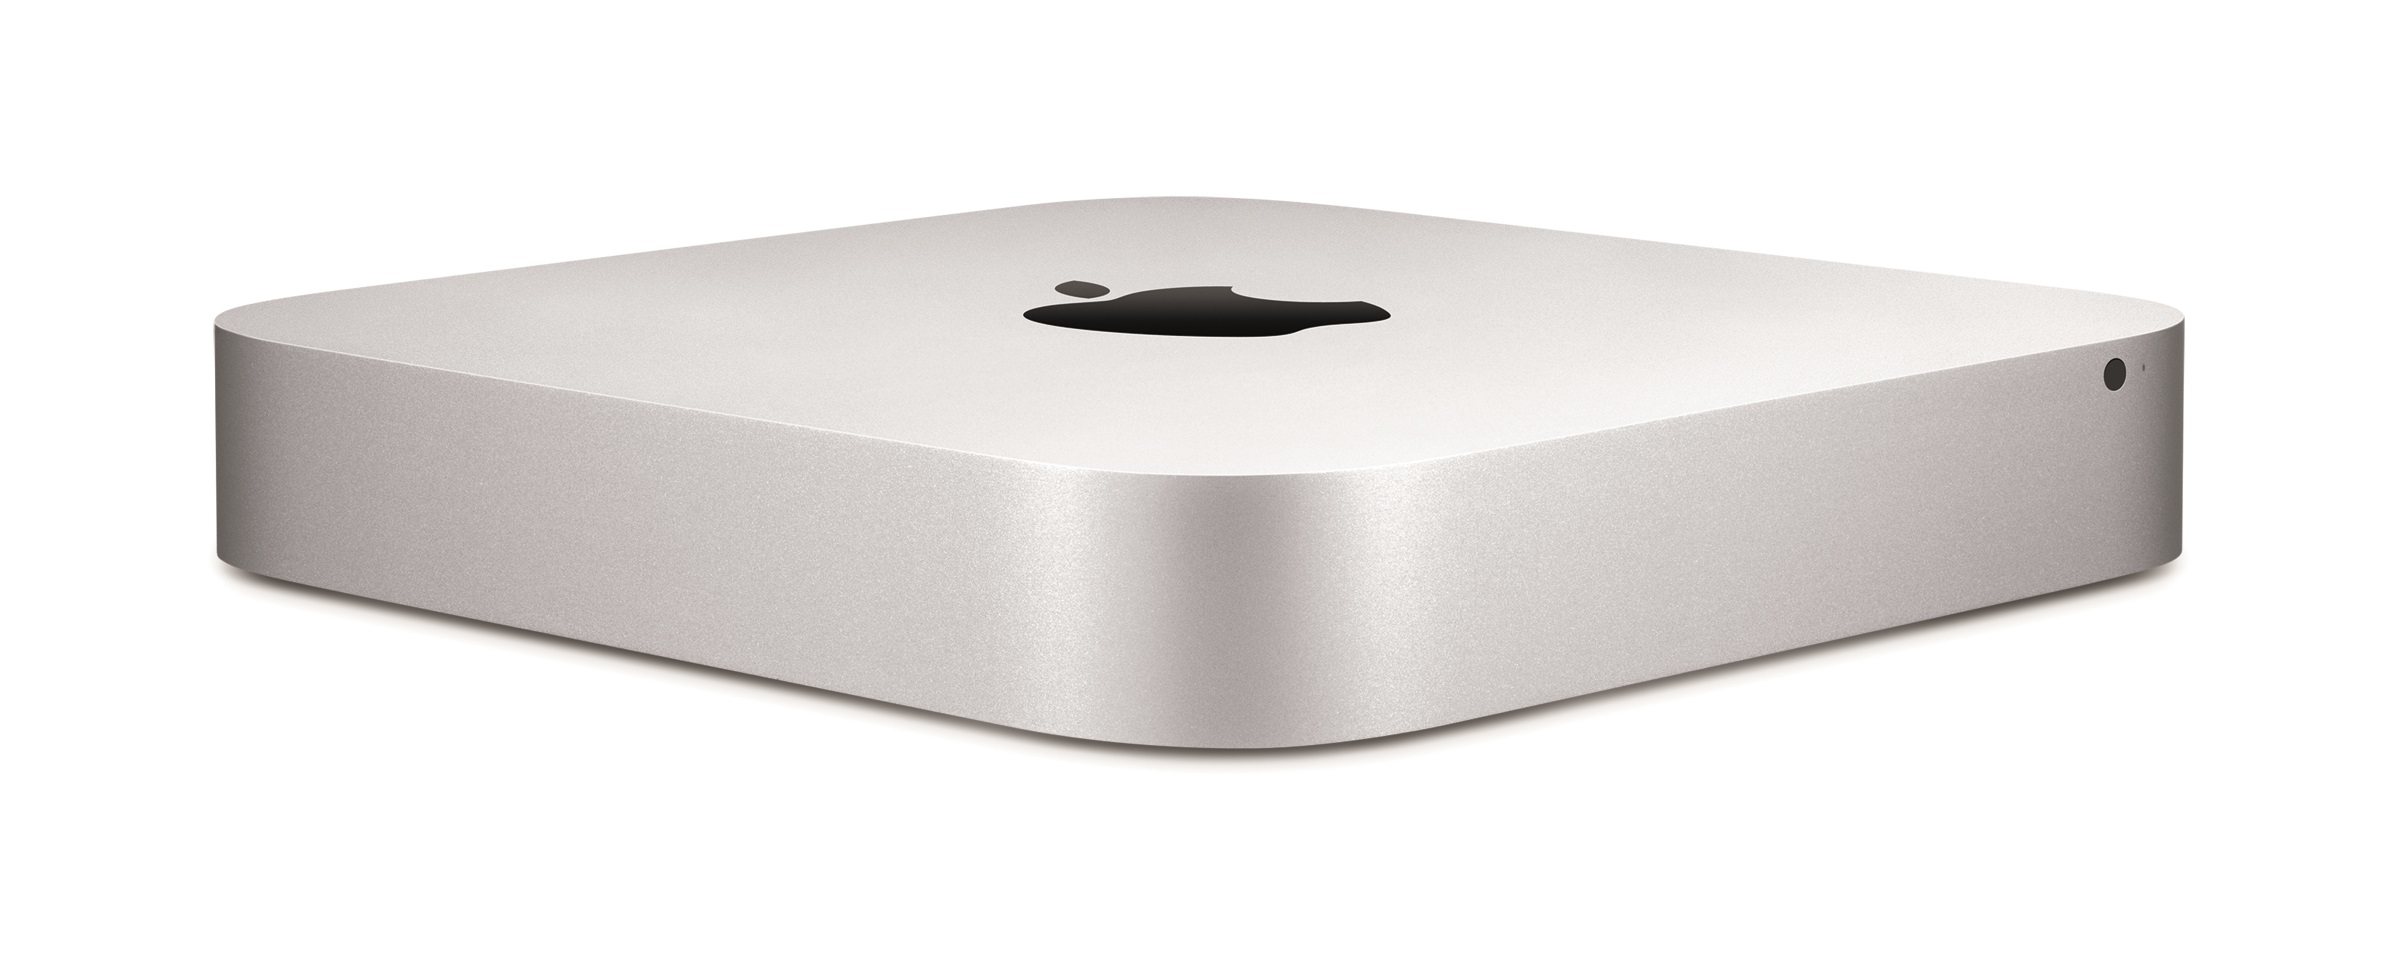 Apple Mac mini 2.8GHz 1.4GHz Nettop Silver